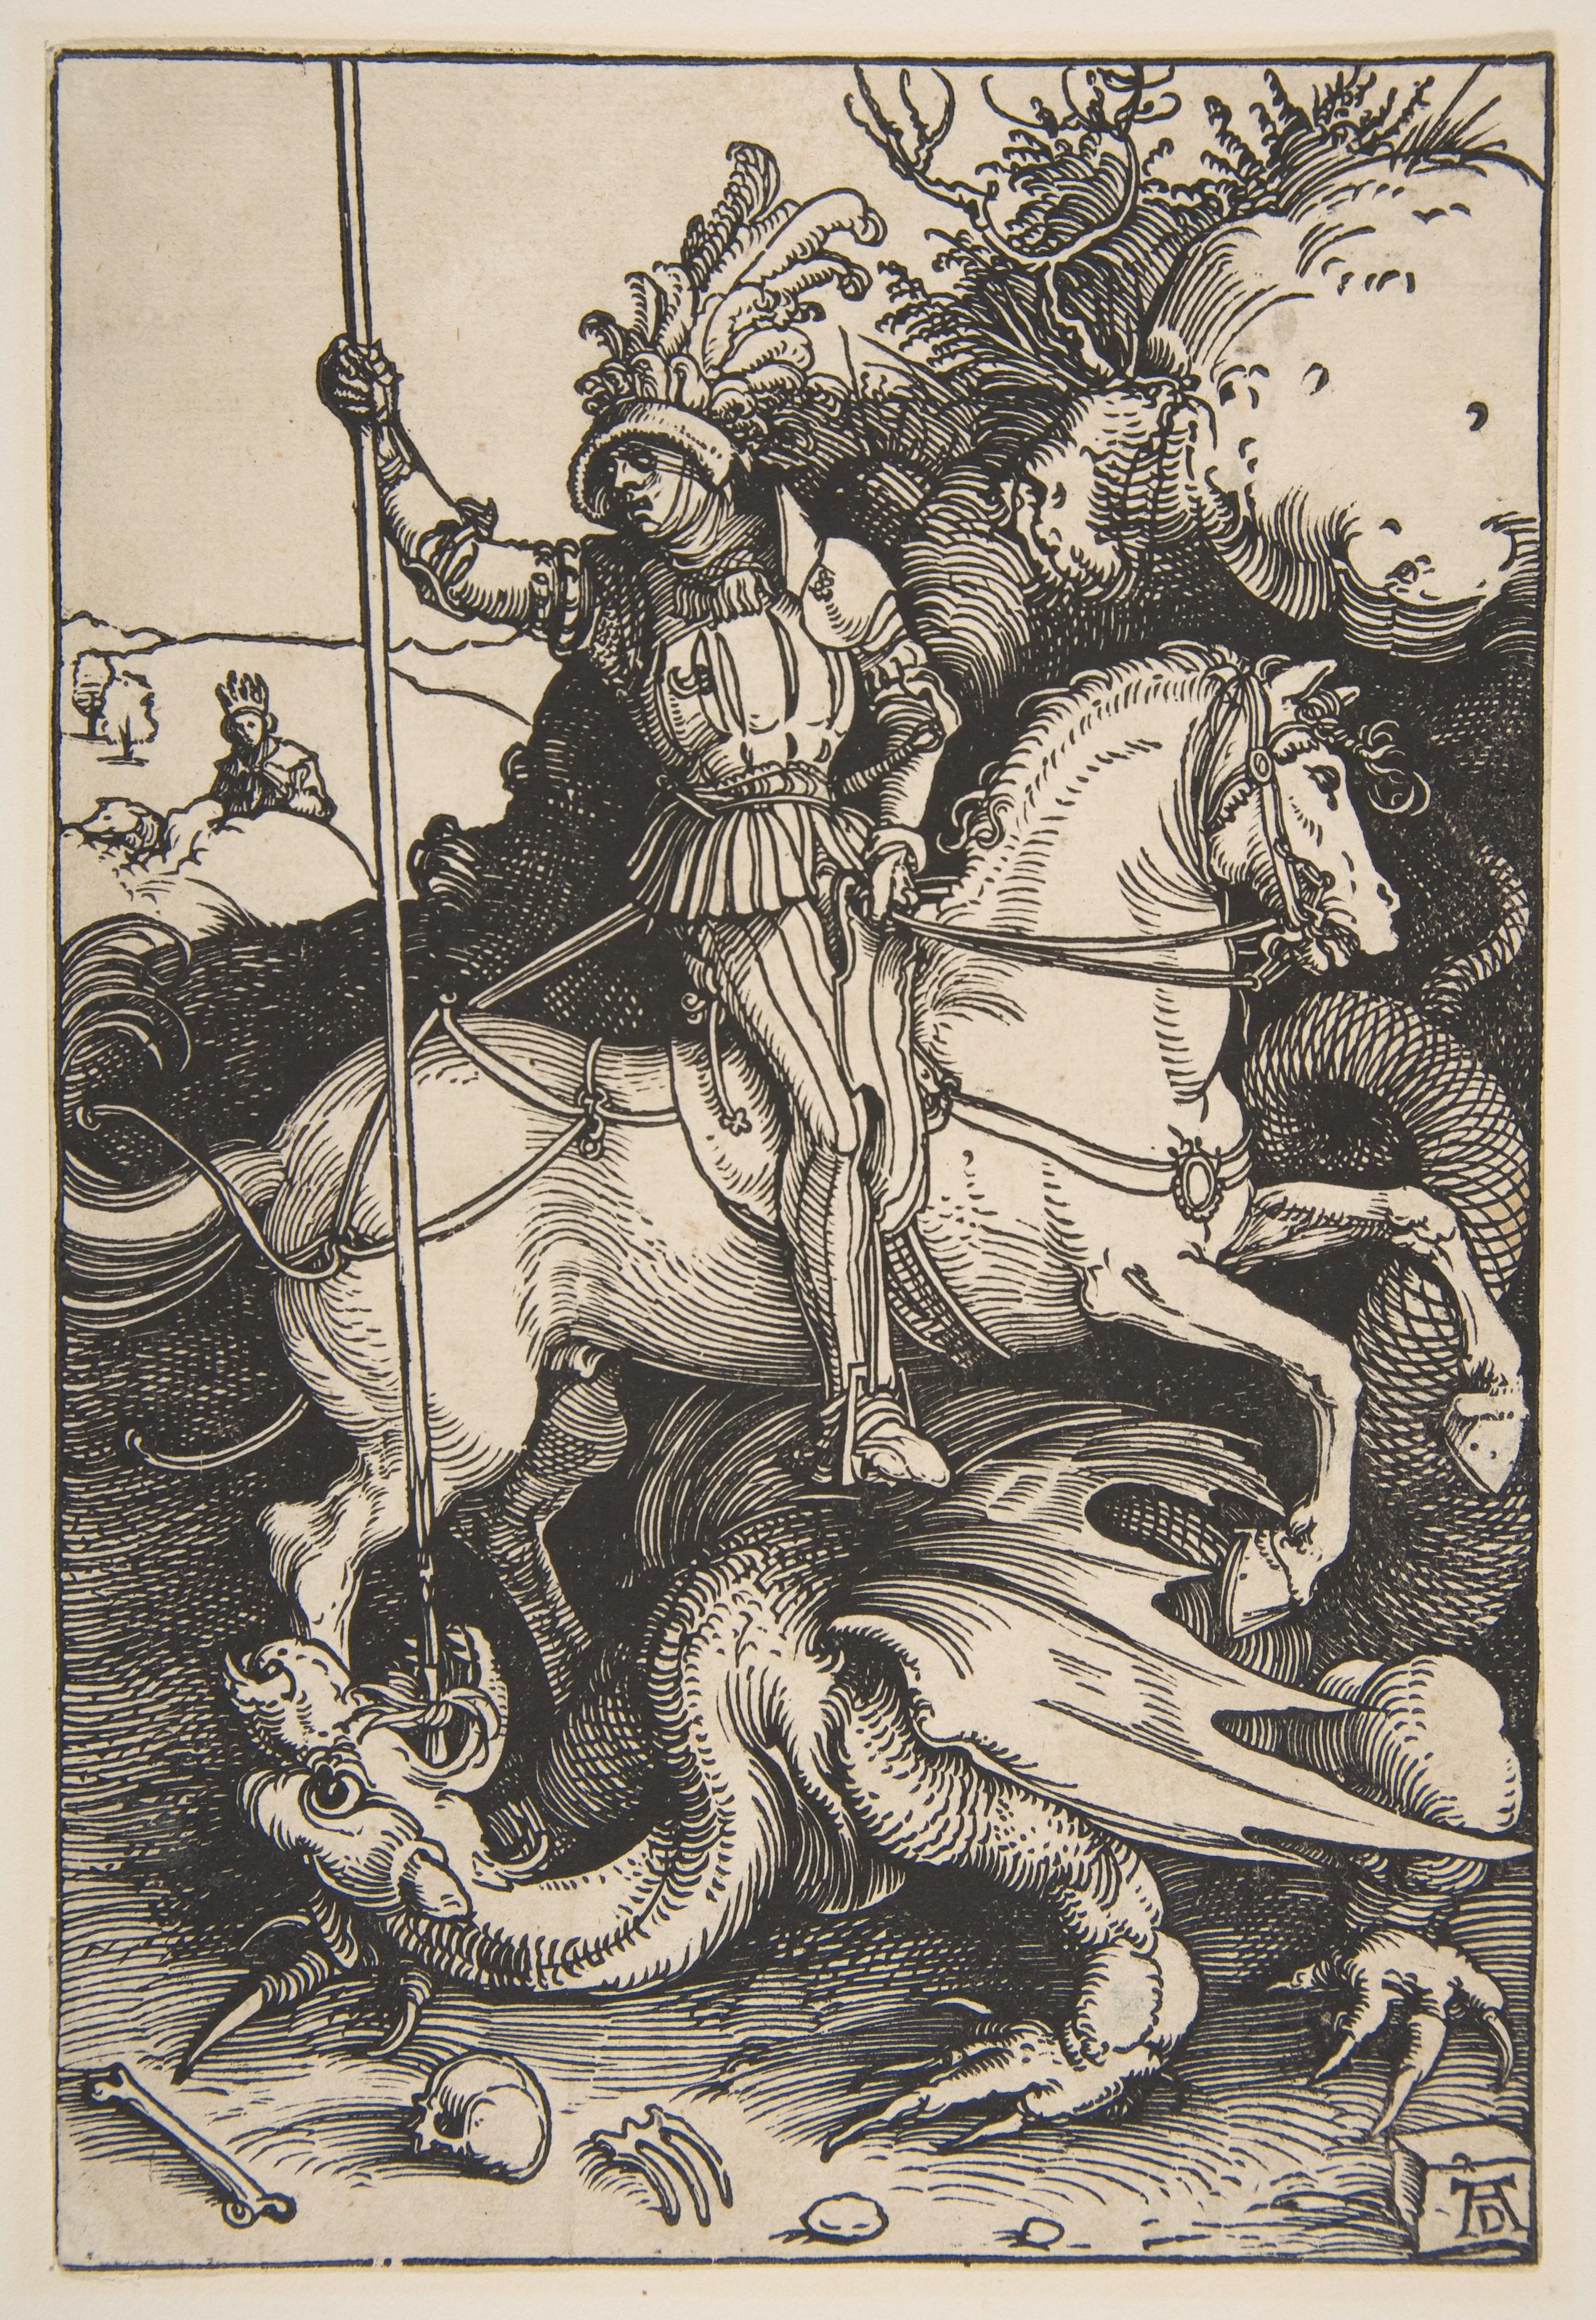 Saint George and the Dragon, cr. 1504, Albrecht Dürer, Germany